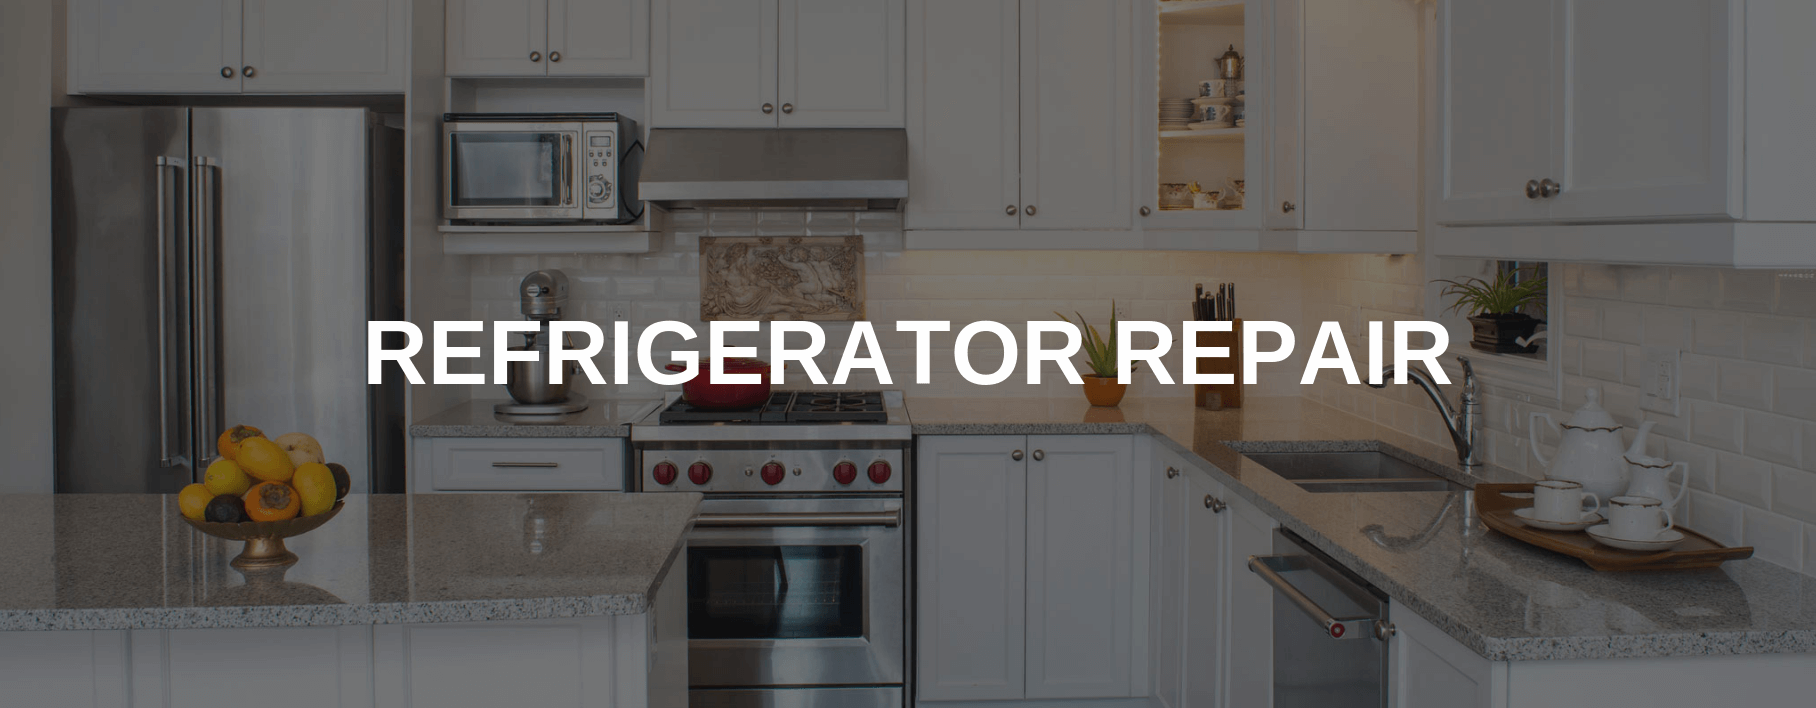 refrigerator repair parma